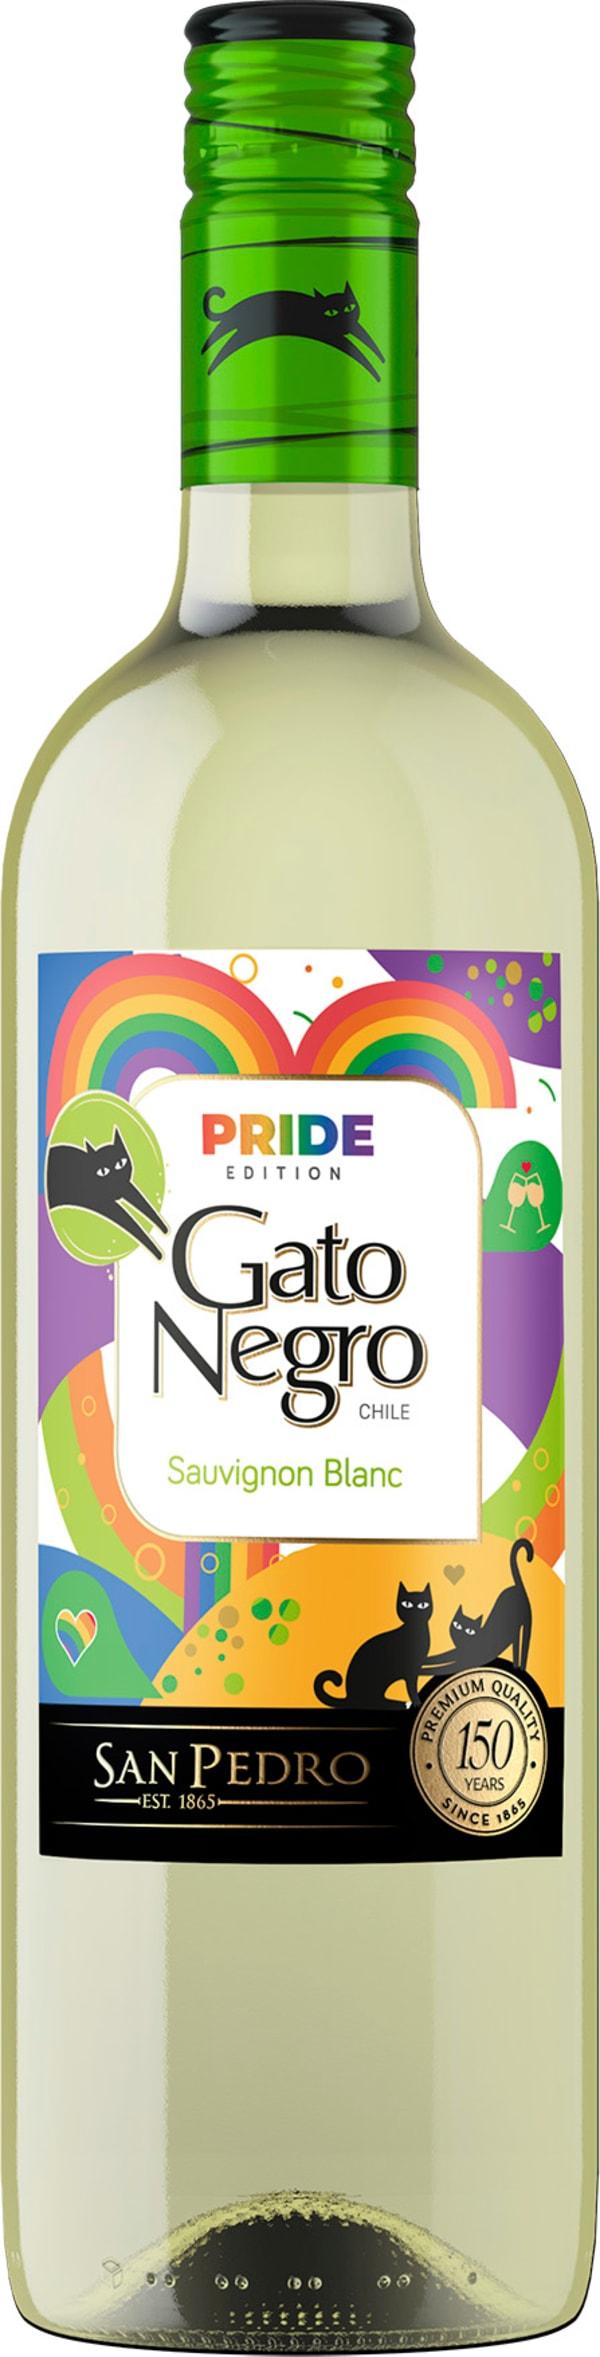 Gato Negro Sauvignon Blanc 2020